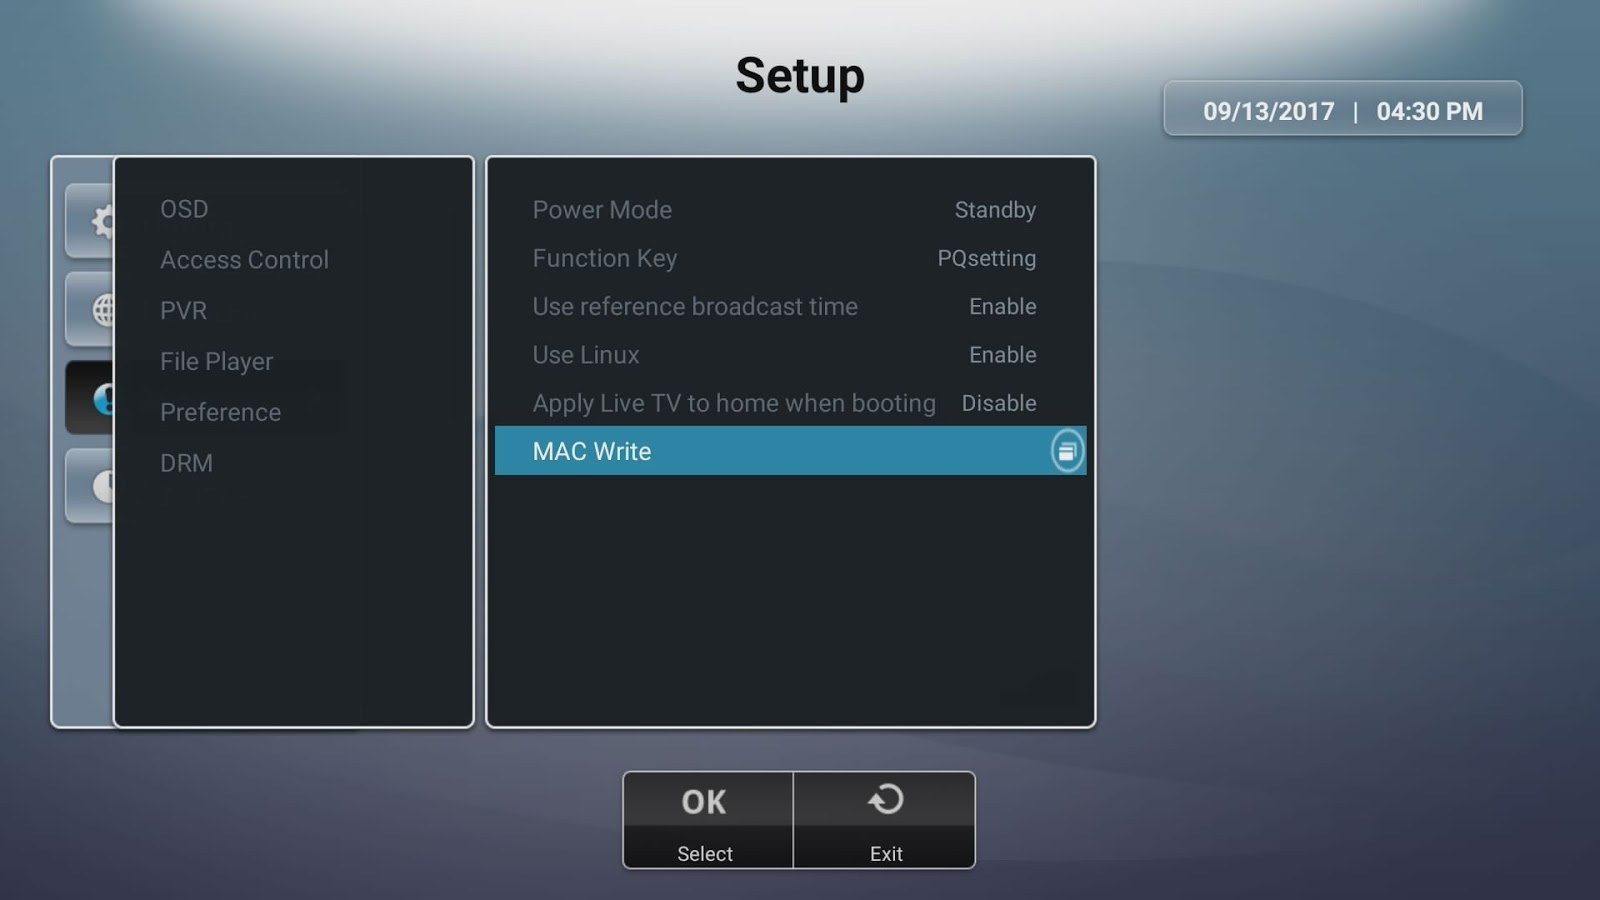 How to edit Mac address after upgrading U5PVR ATV7 firmware  | U5PVR